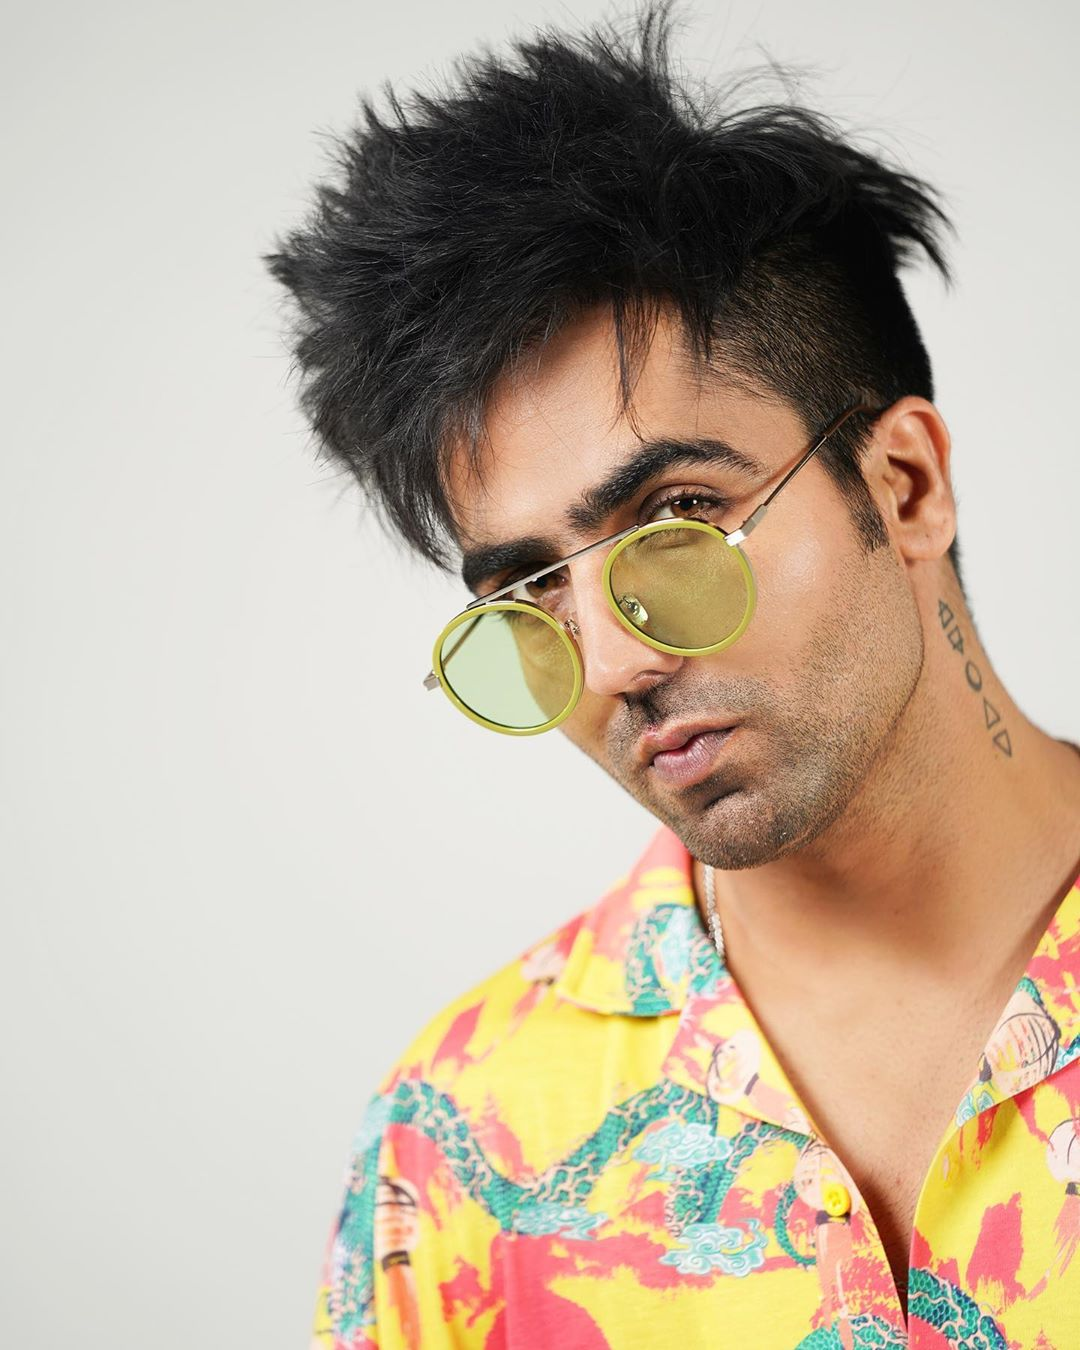 hardy Sandhu hairstyle pic